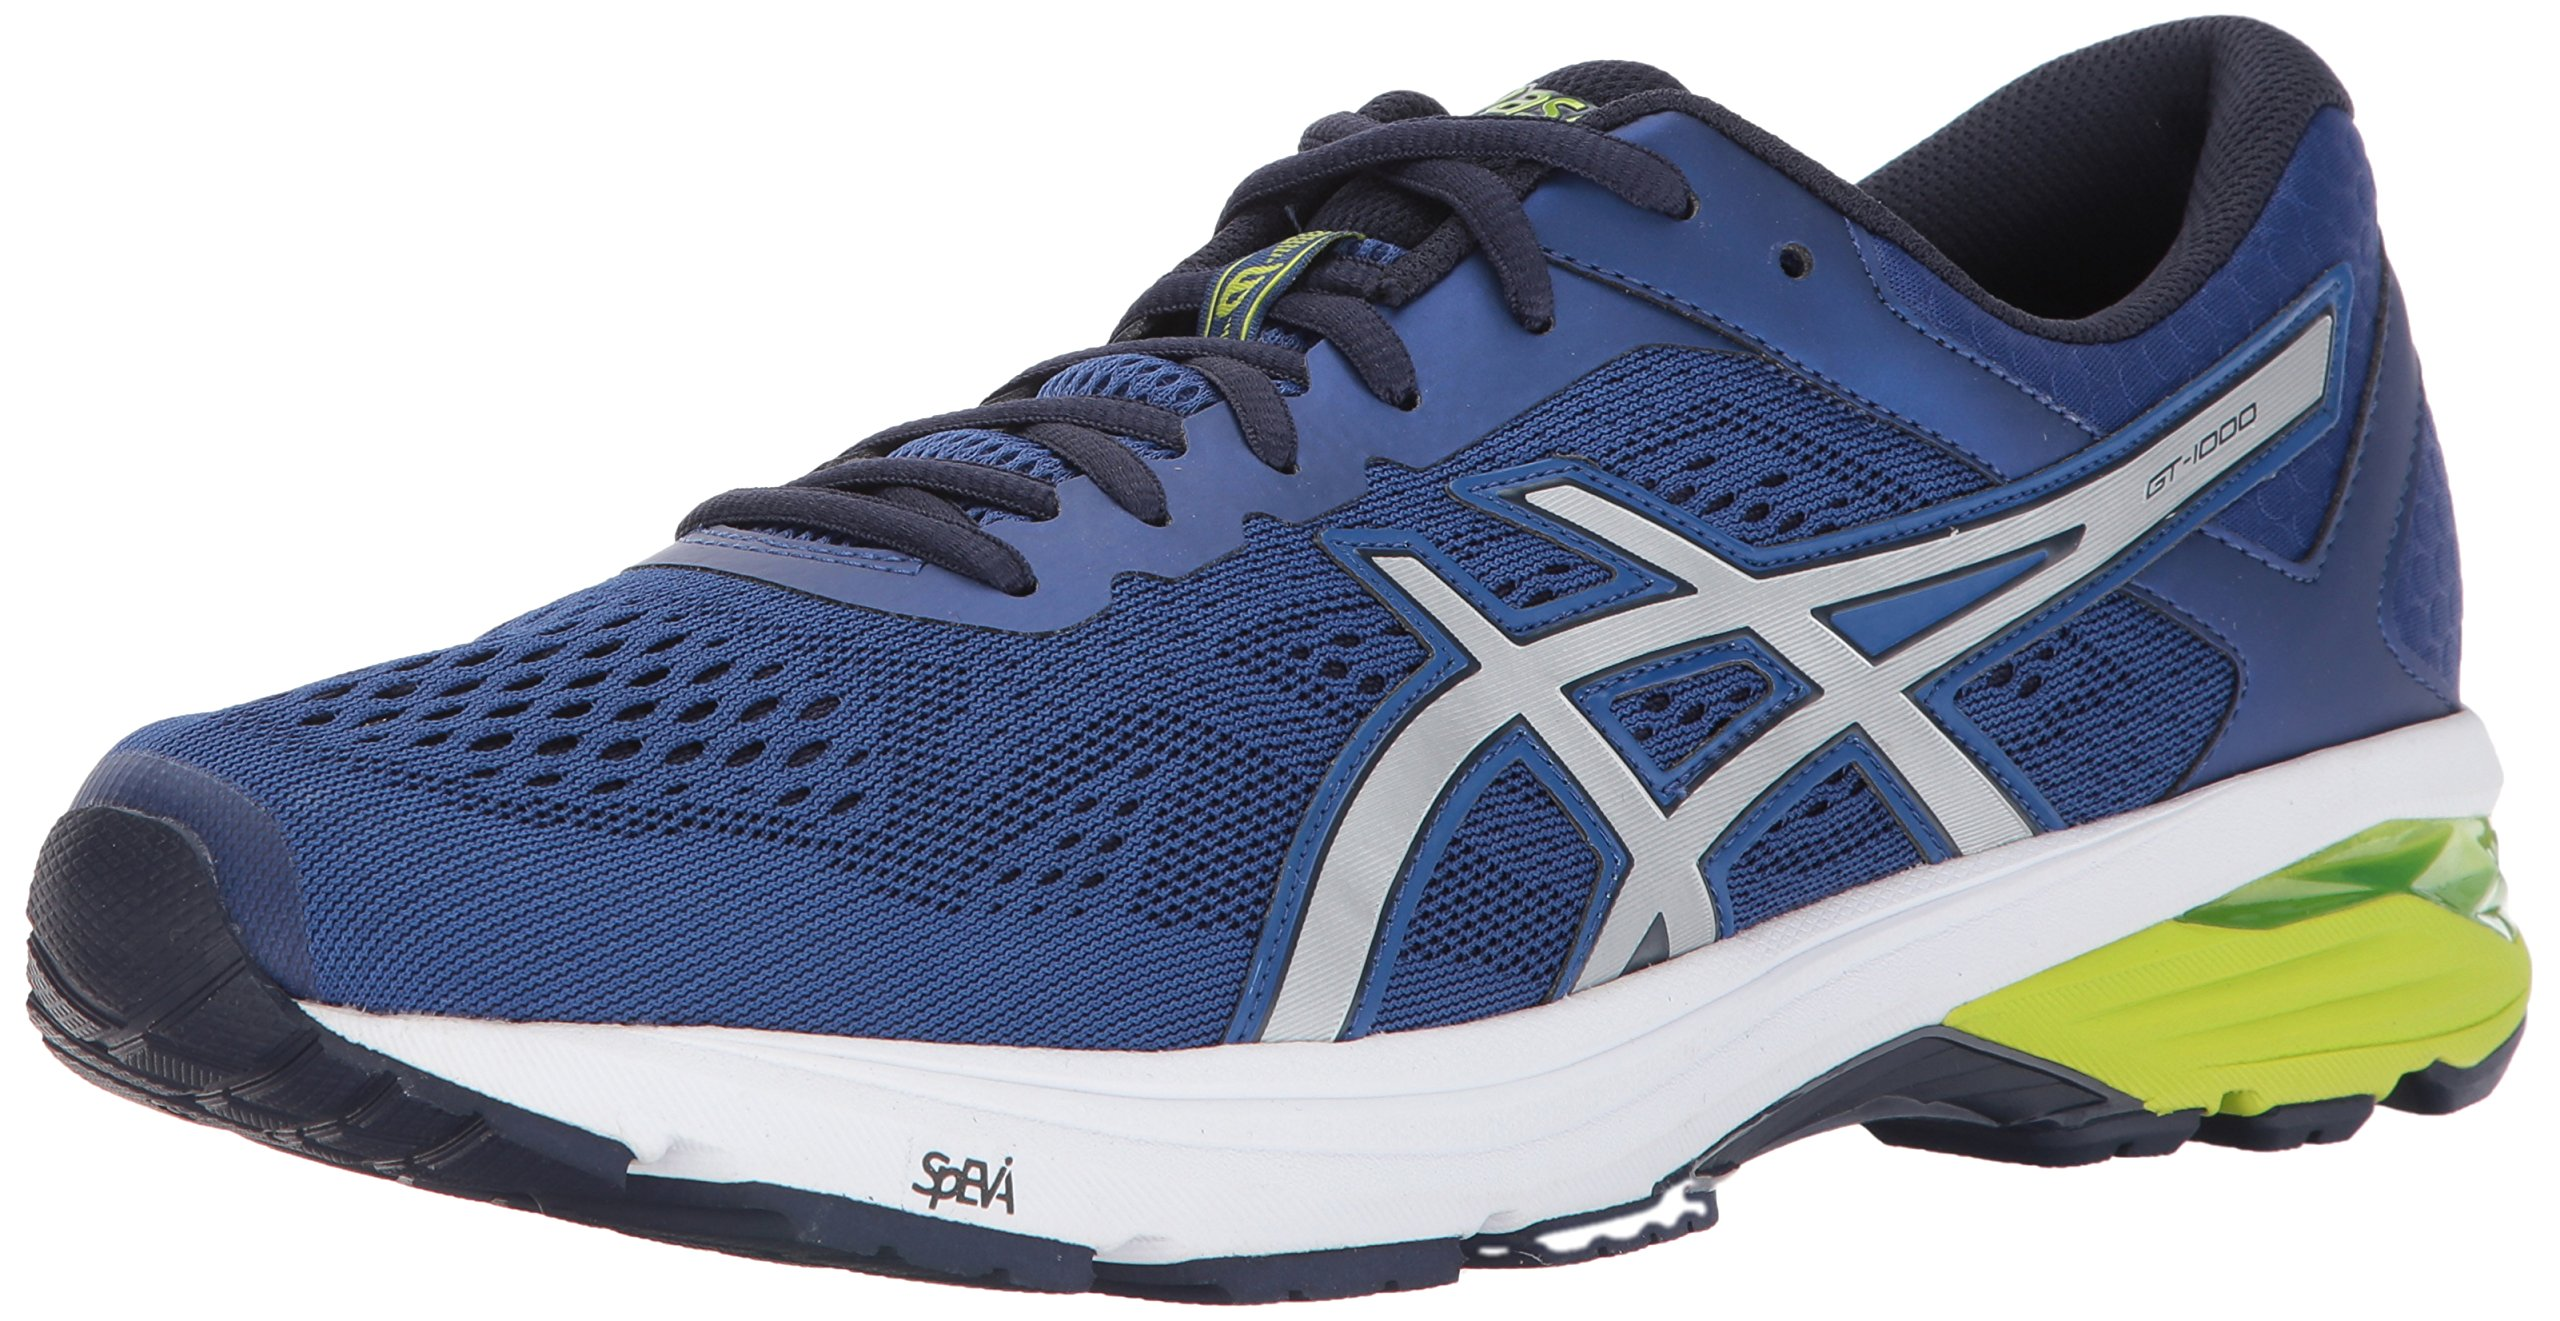 488ae3a712bc Galleon - ASICS Men s GT-1000 6 Running Shoe